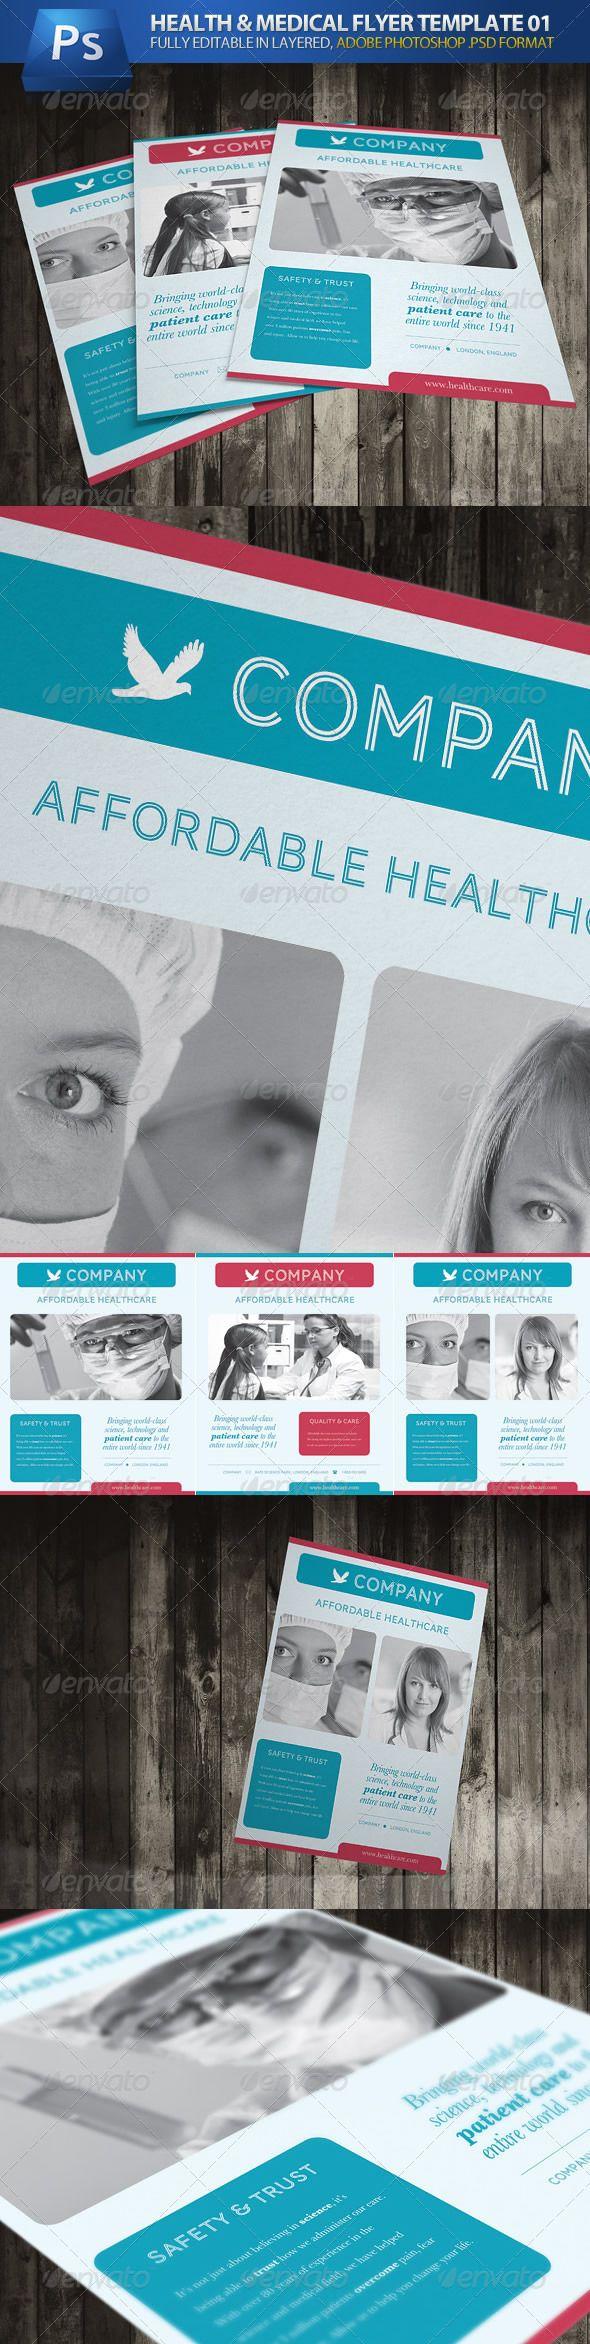 Health & Medical Flyer 01